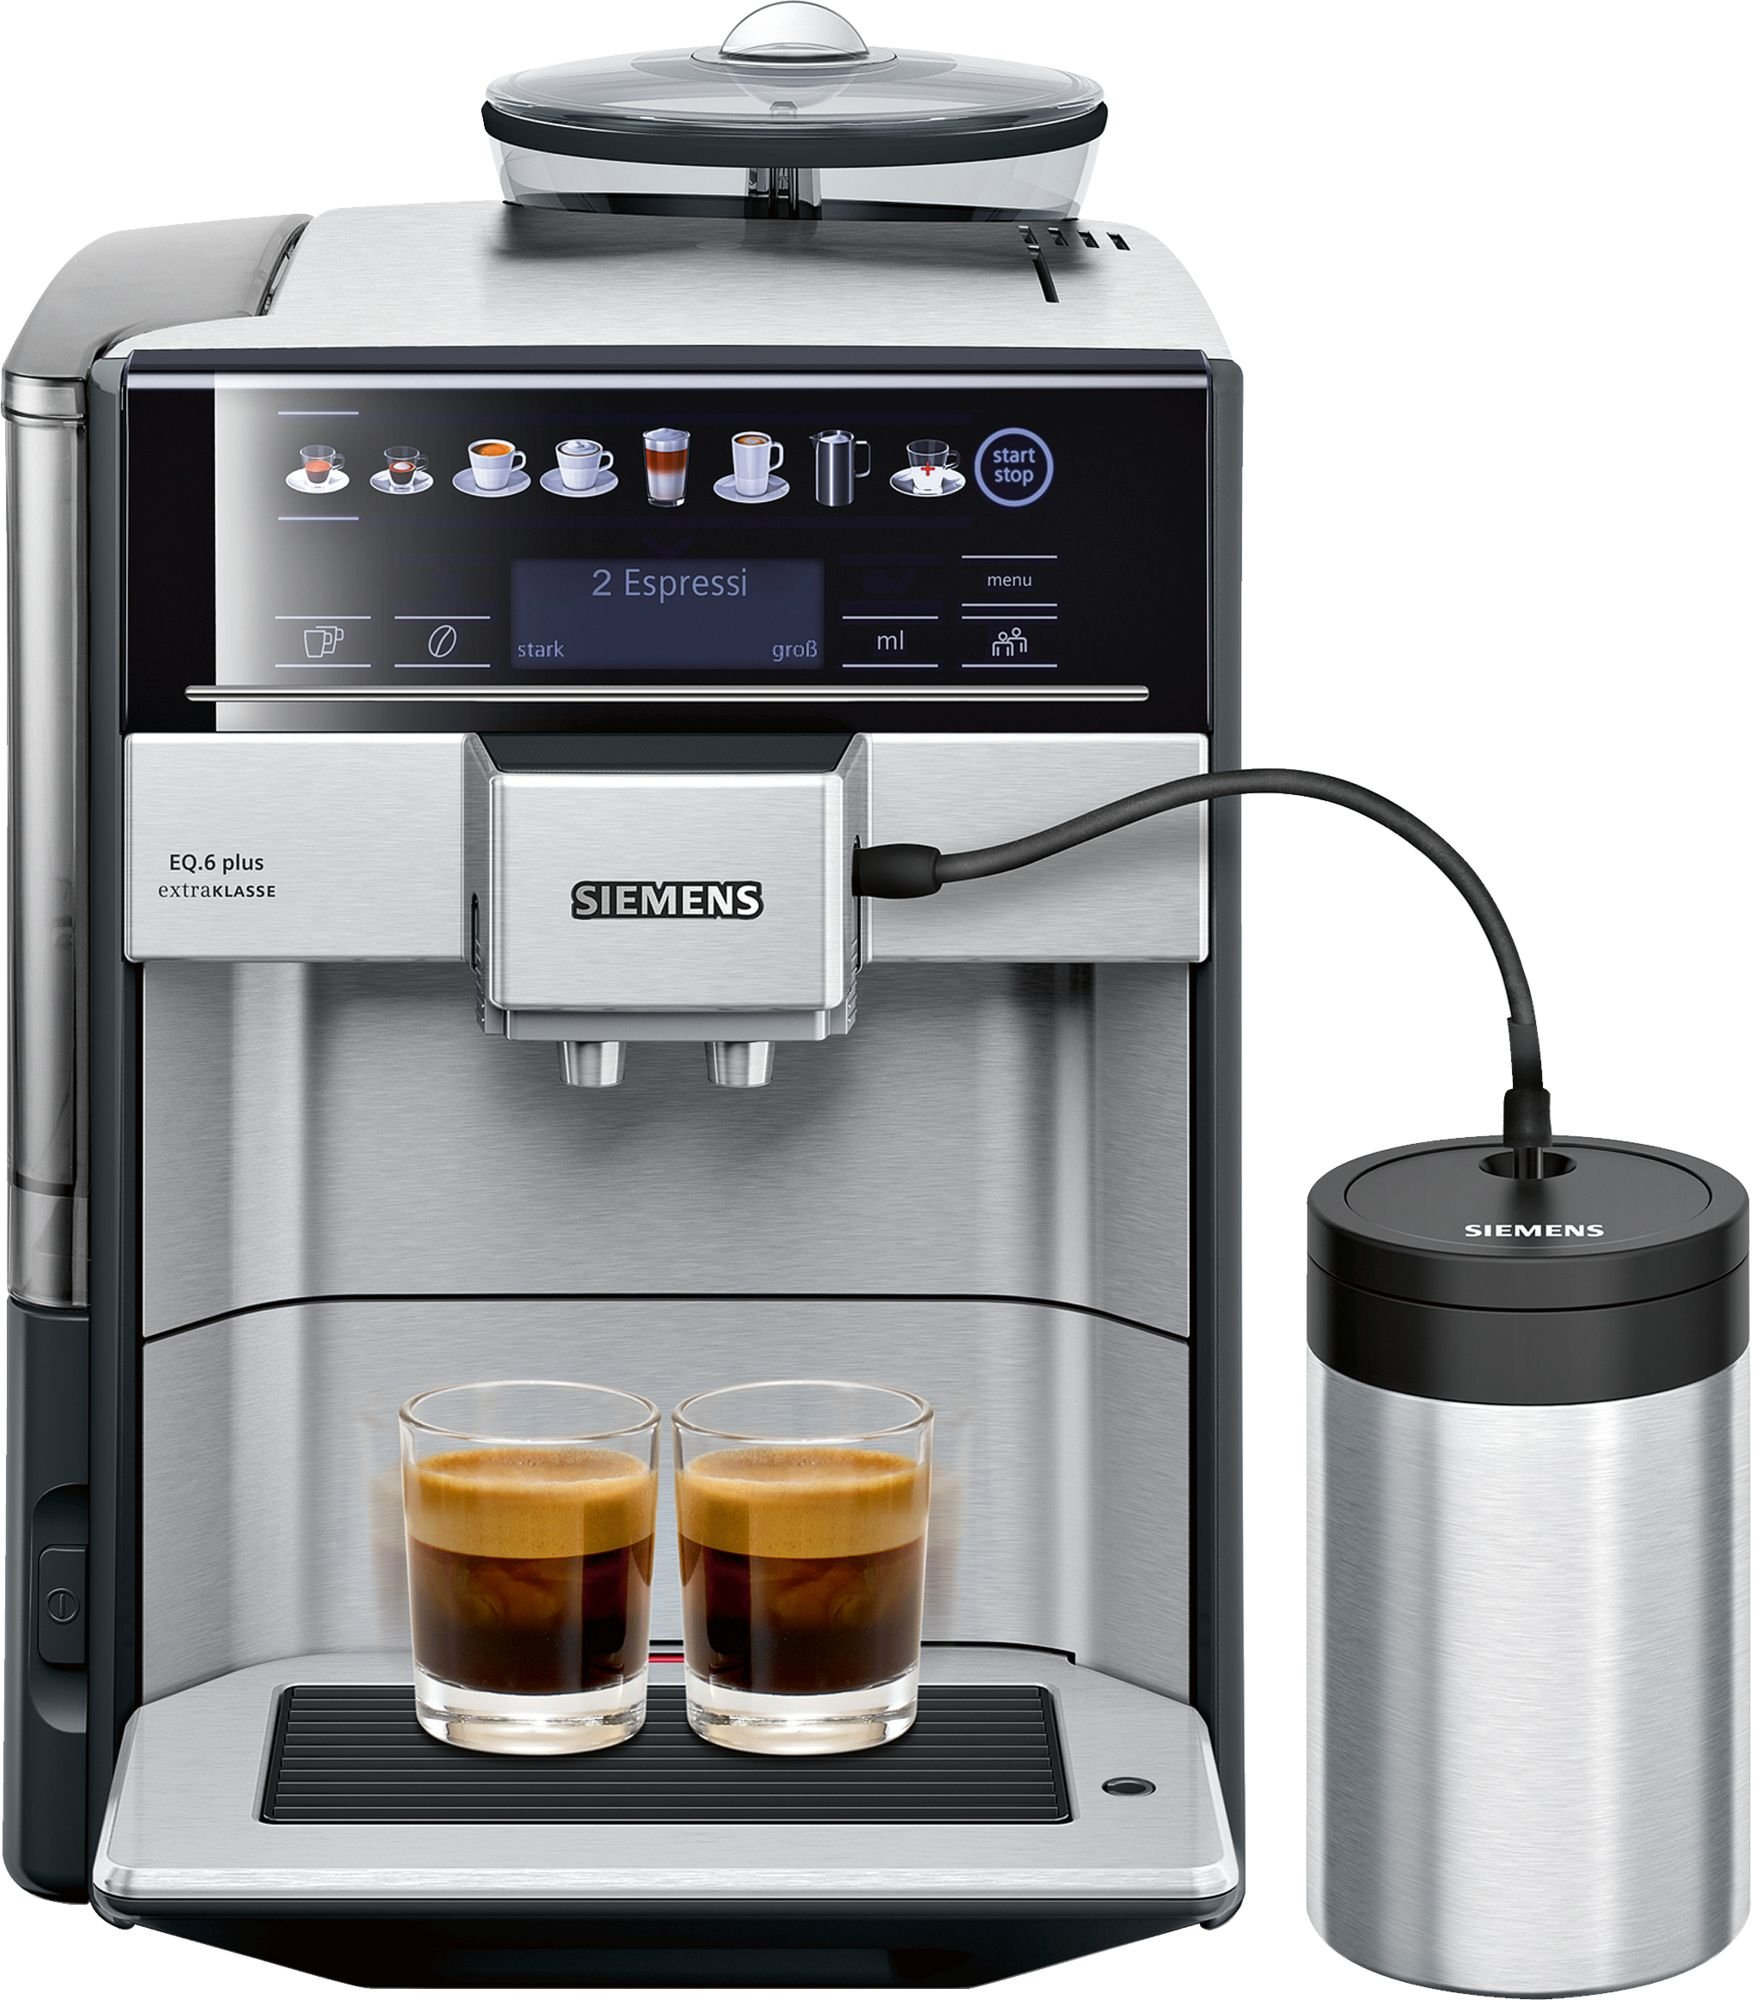 Siemens TE657F03DE EQ.6 plus S700 Extraklasse Kaffeevollautomat +Milchbehälter